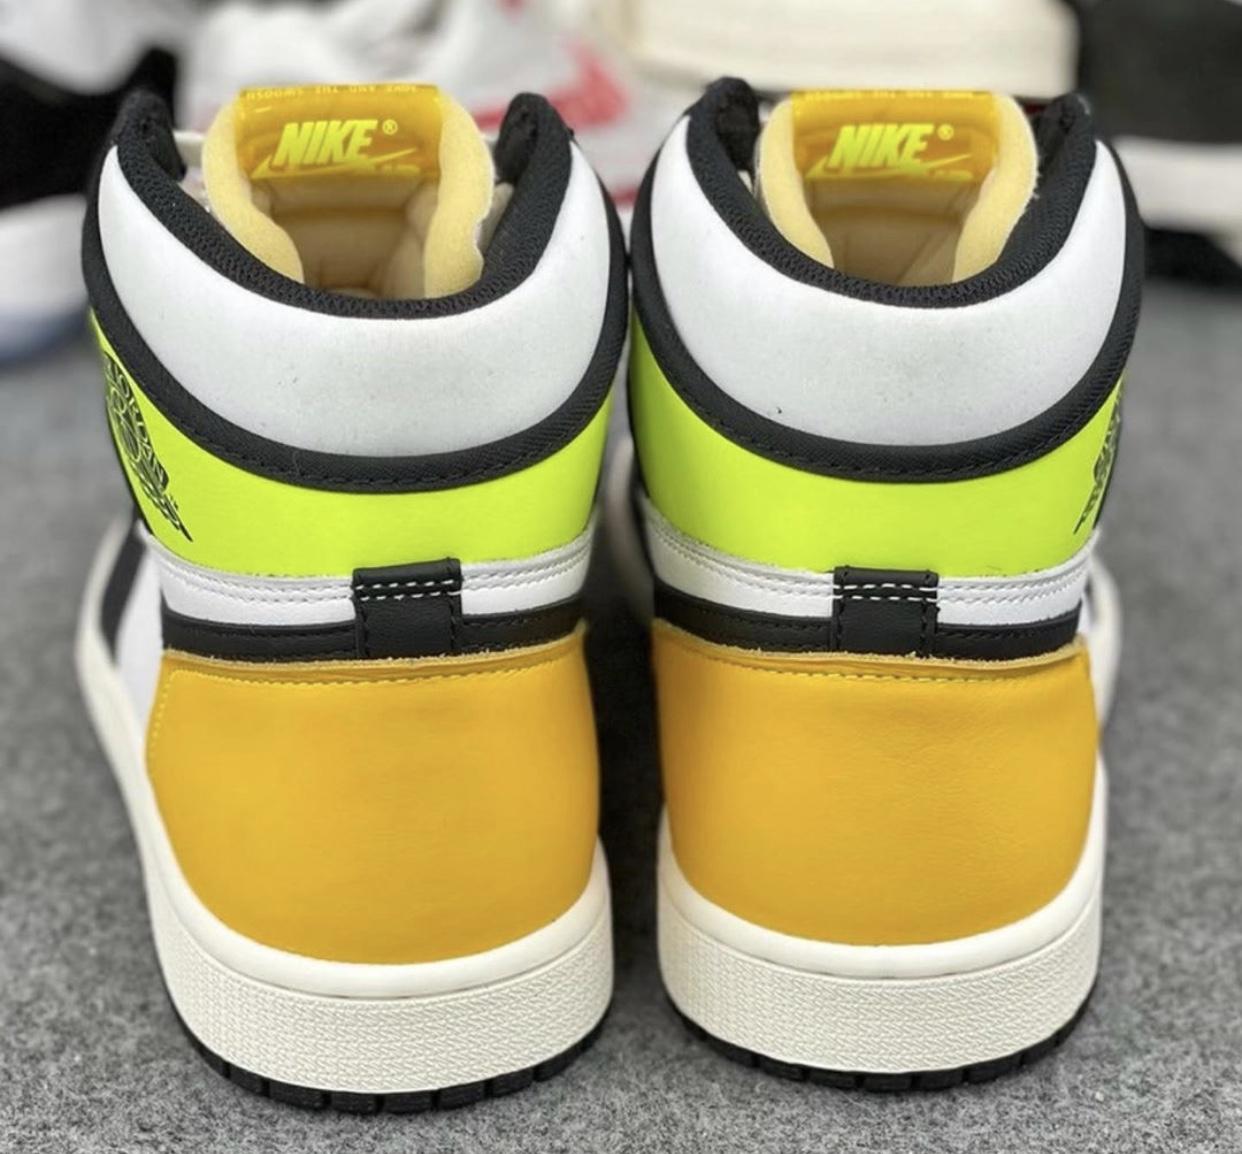 Air Jordan 1 Volt Gold 555088-118 Release Details